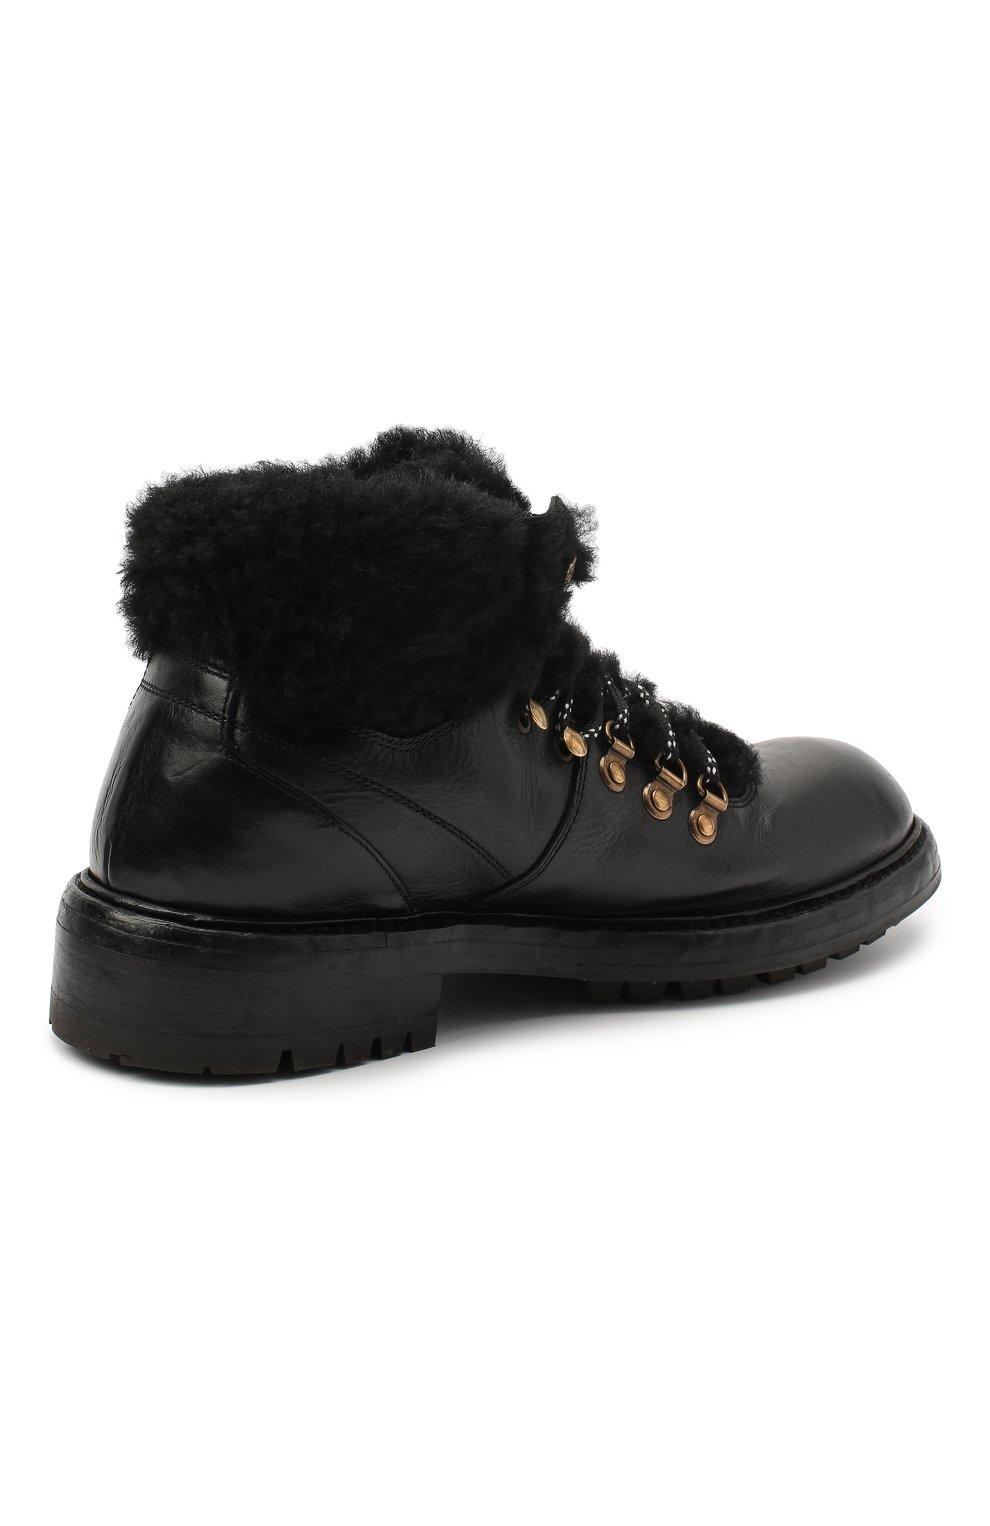 Мужские кожаные ботинки bernini DOLCE & GABBANA черного цвета, арт. A60326/AW952 | Фото 4